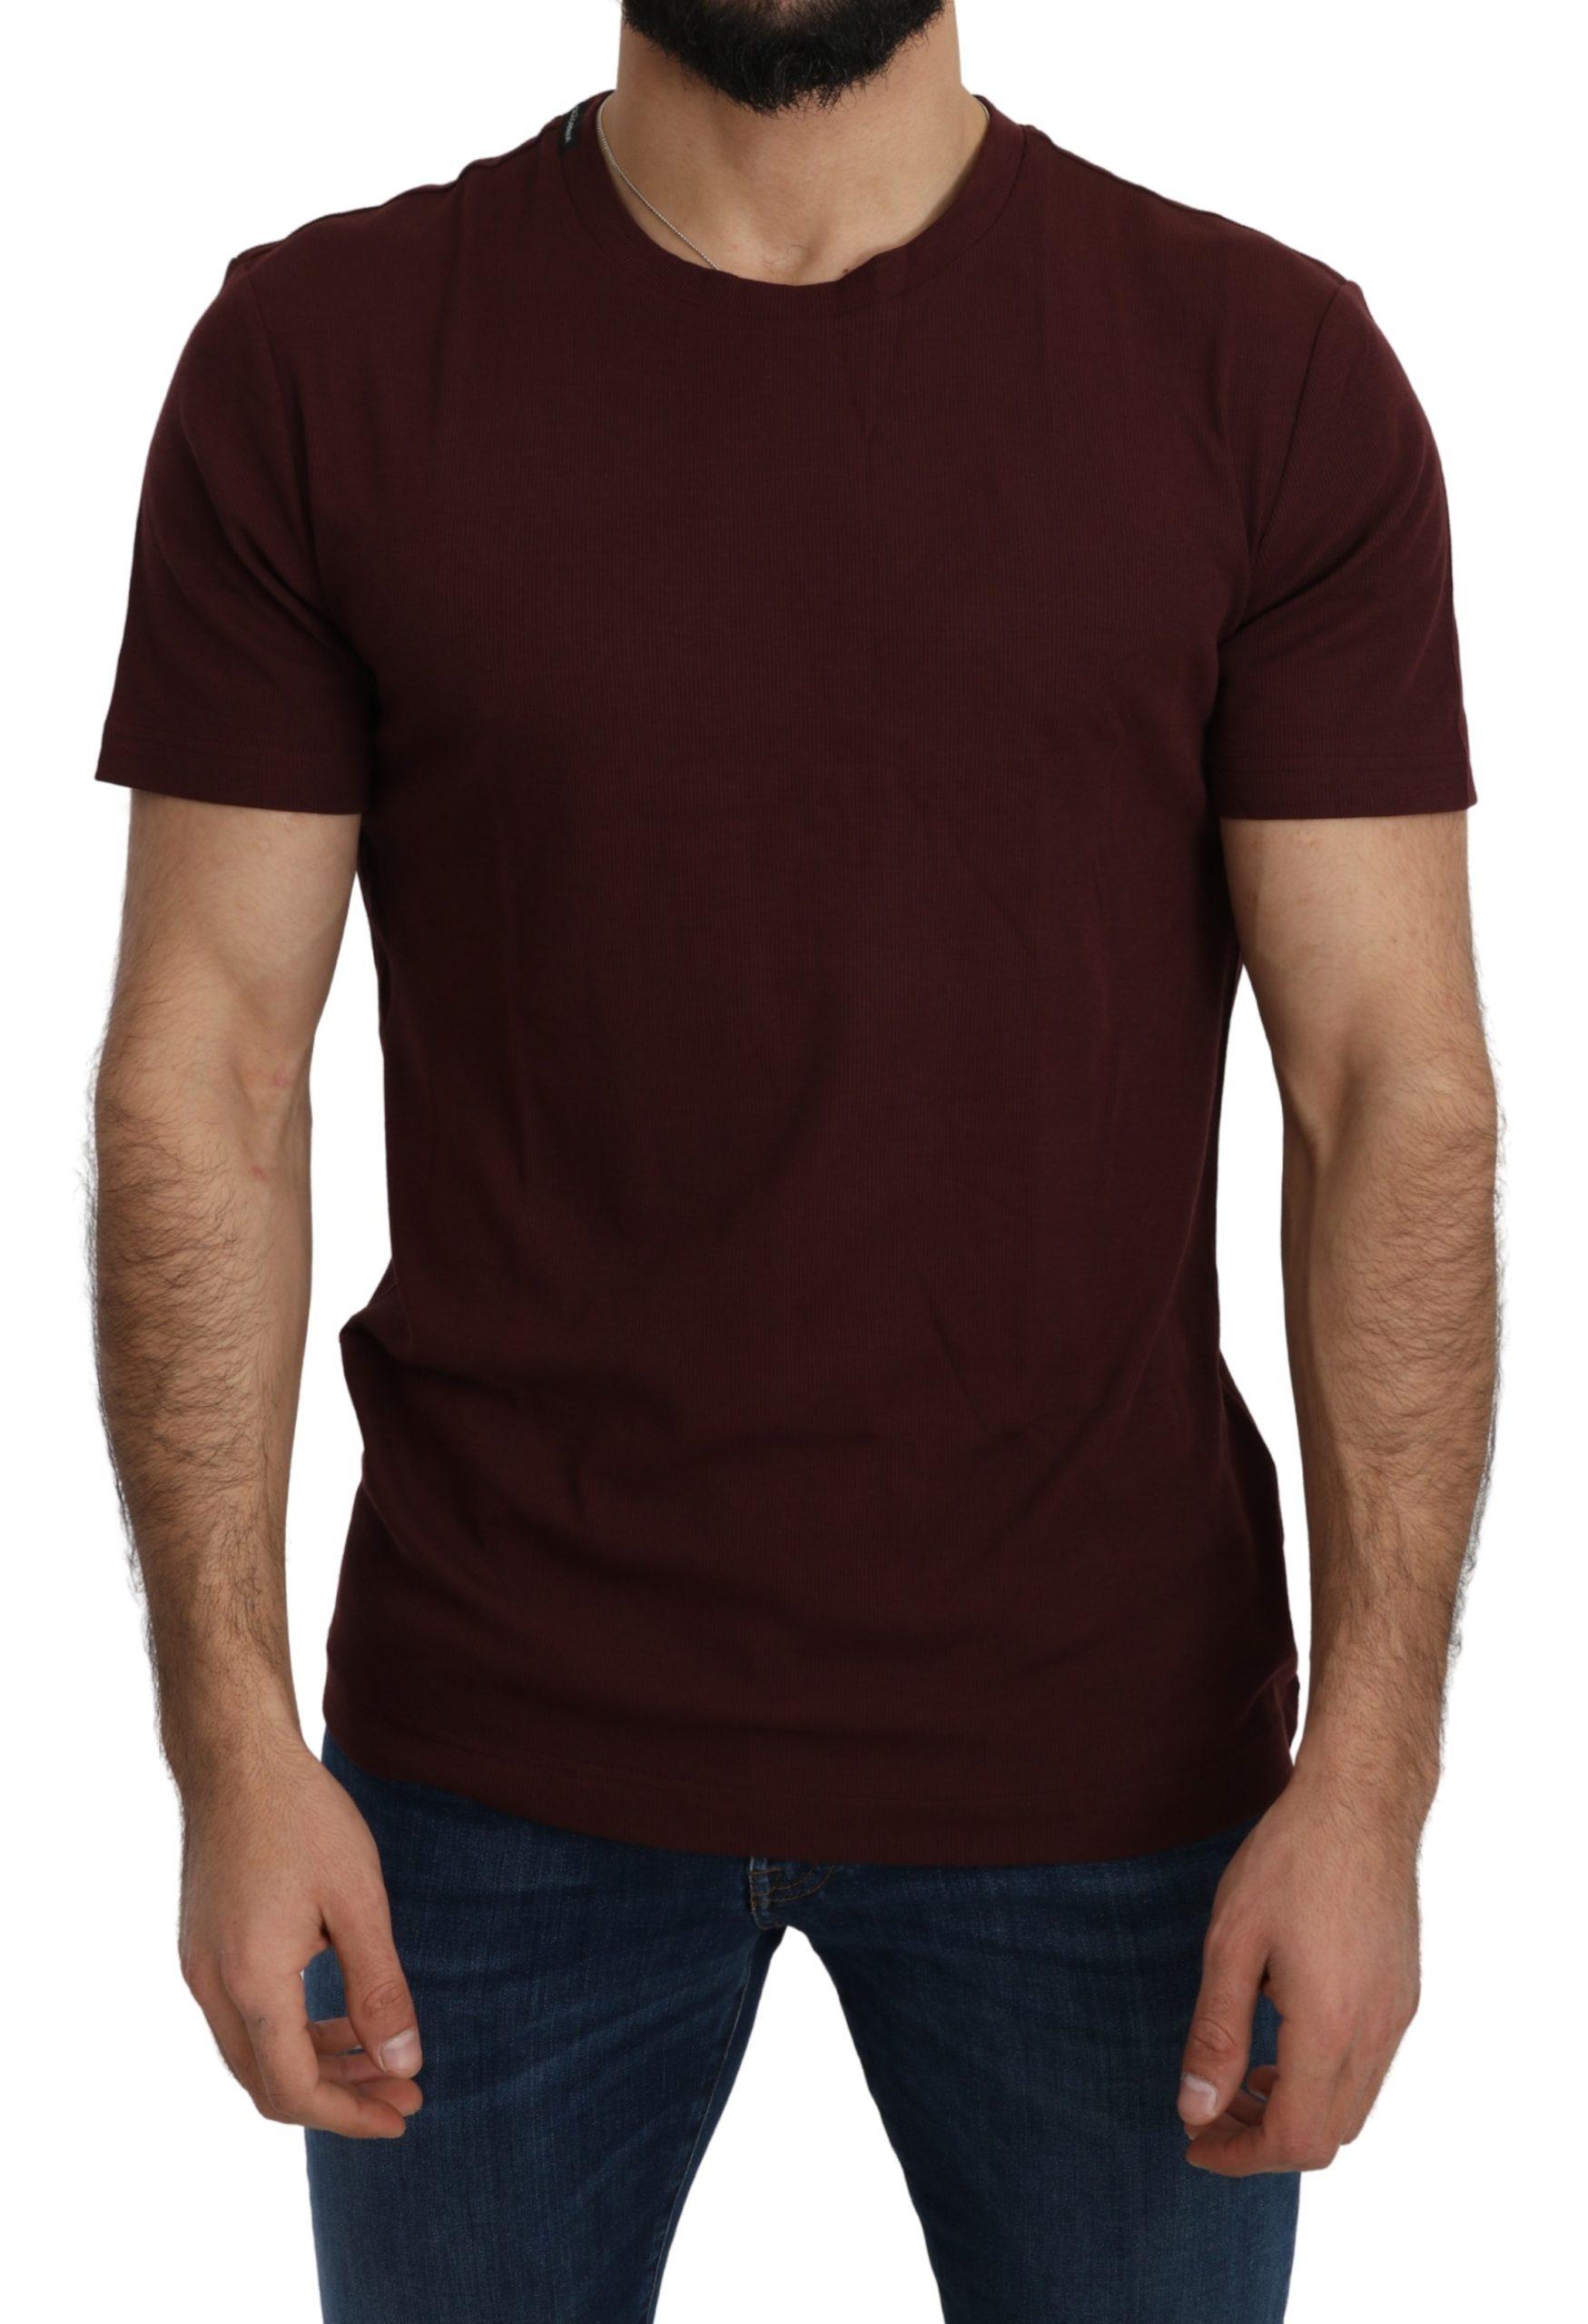 Dolce & Gabbana Men's Slim Fitting Cotton T-Shirt Red TSH5212 - IT46   S